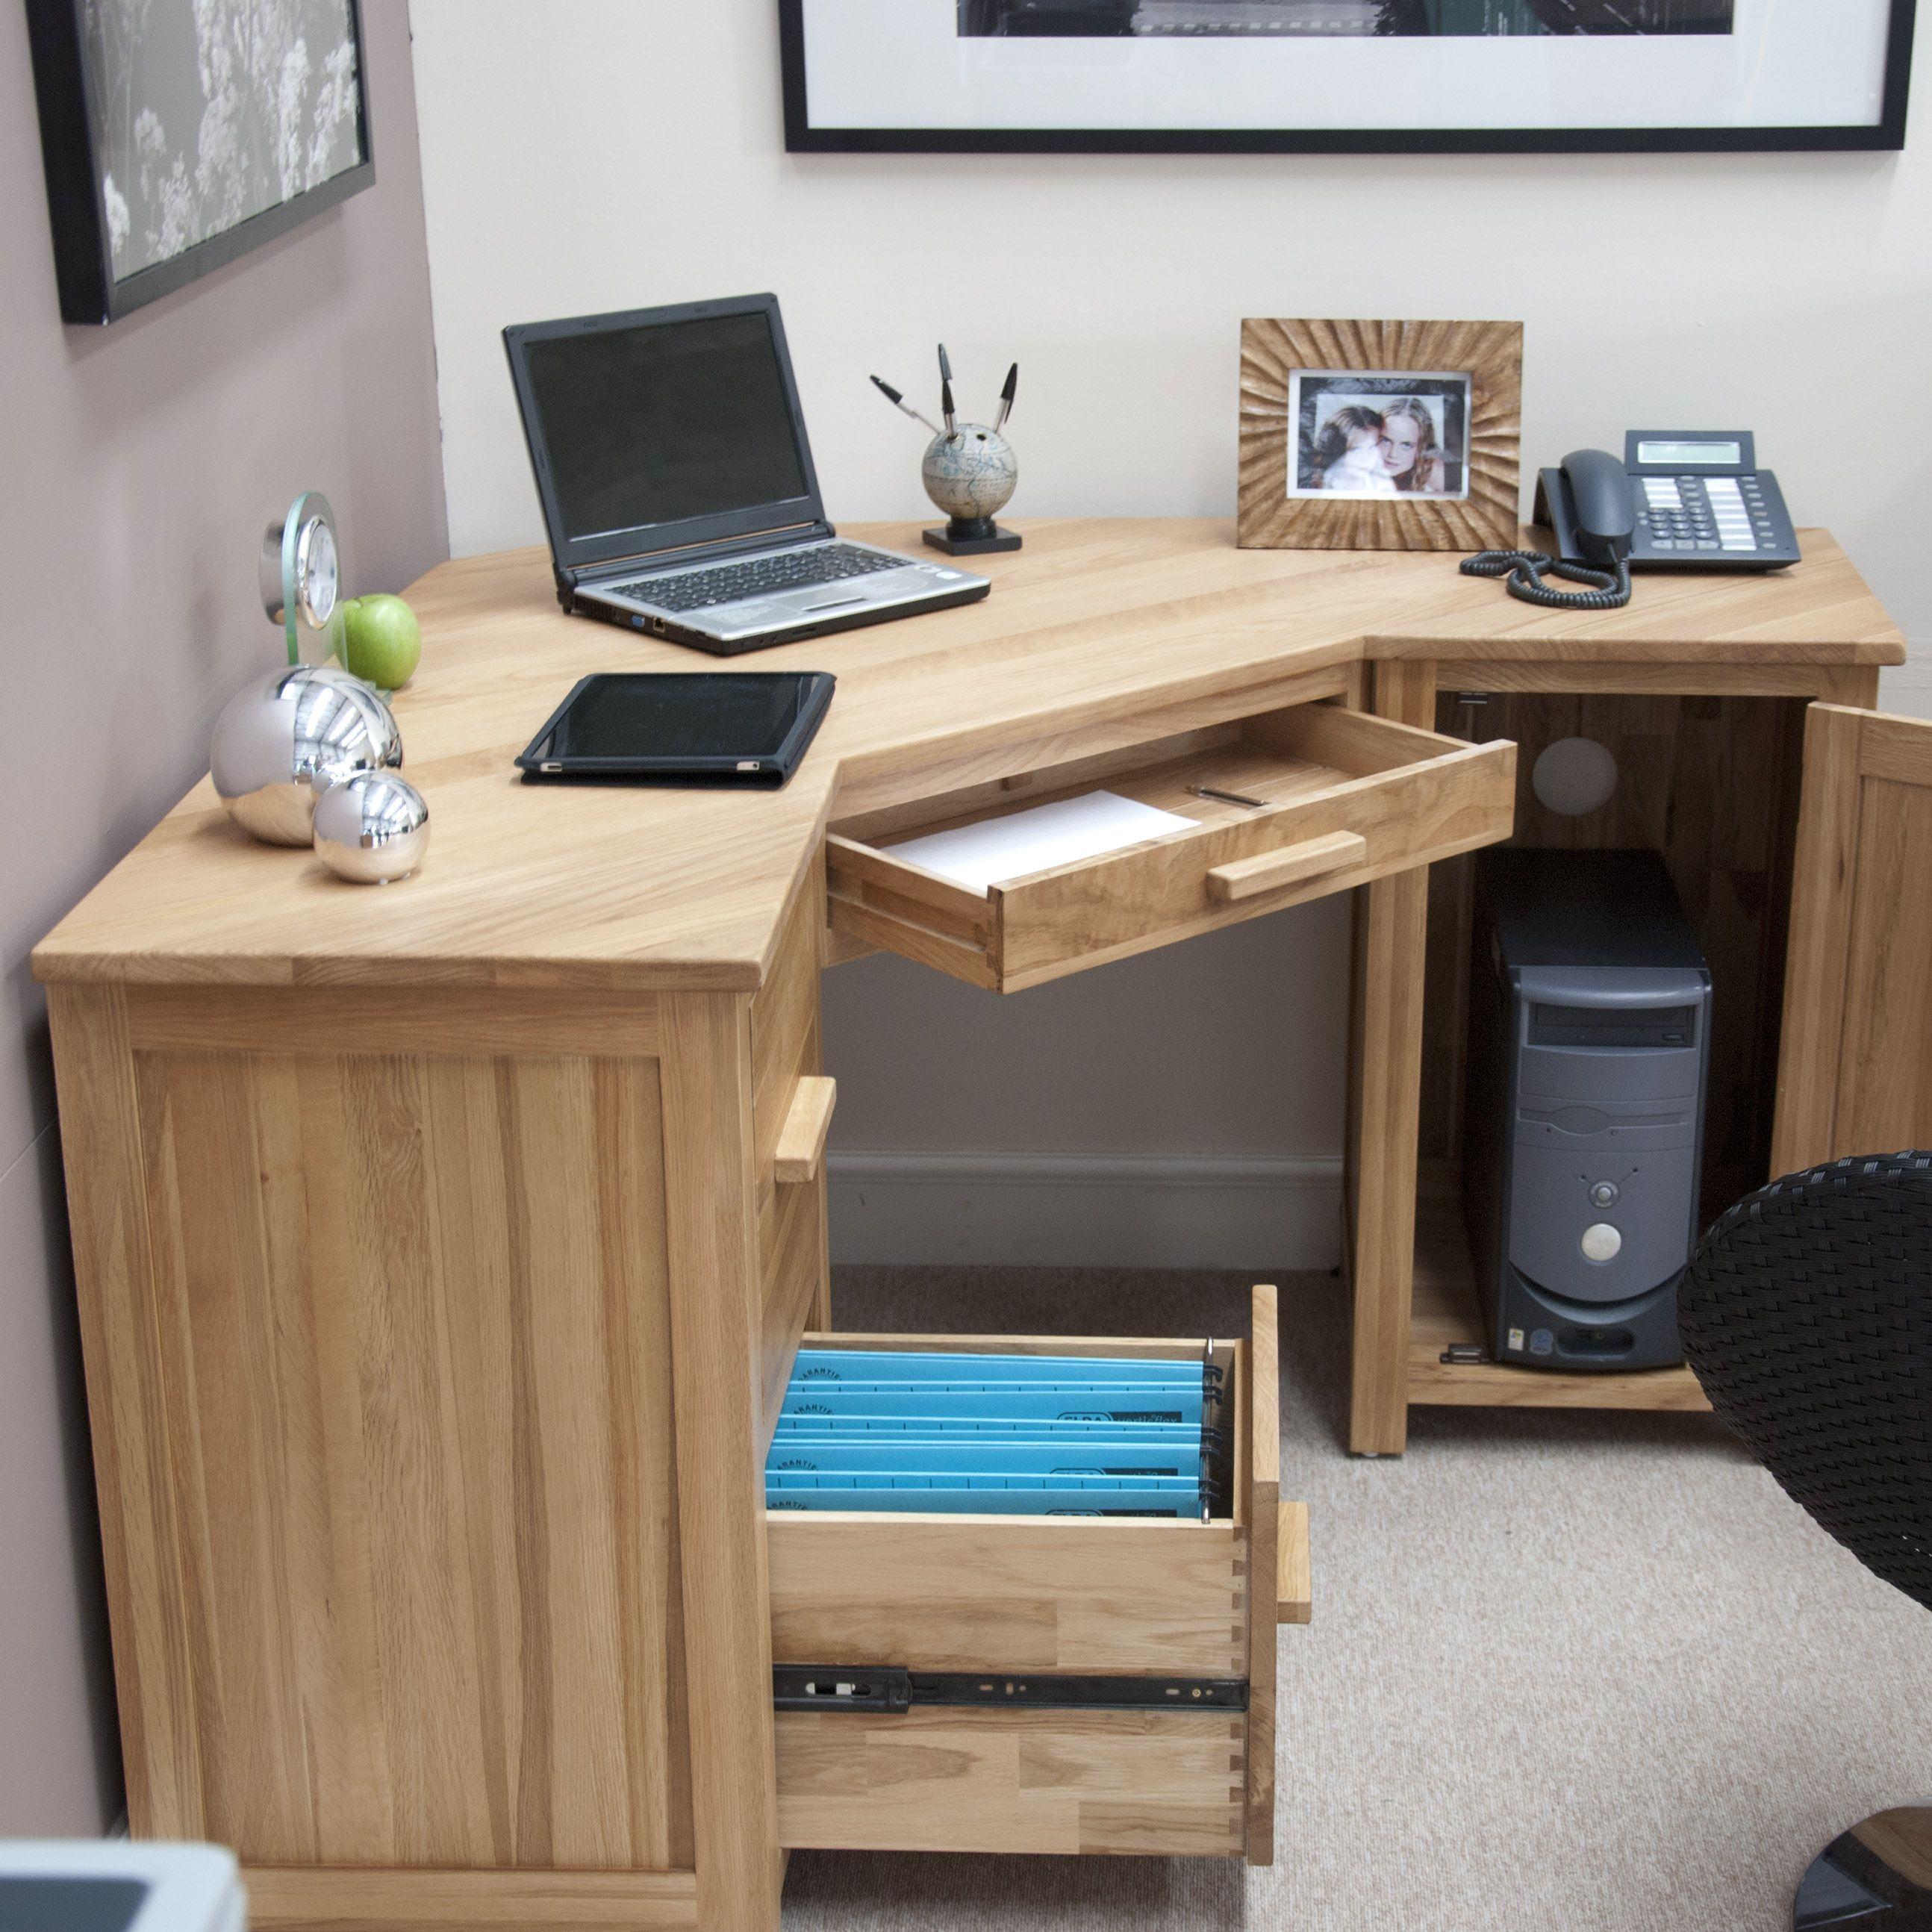 Unvowcom  New Home Design  Diy computer desk Pallet